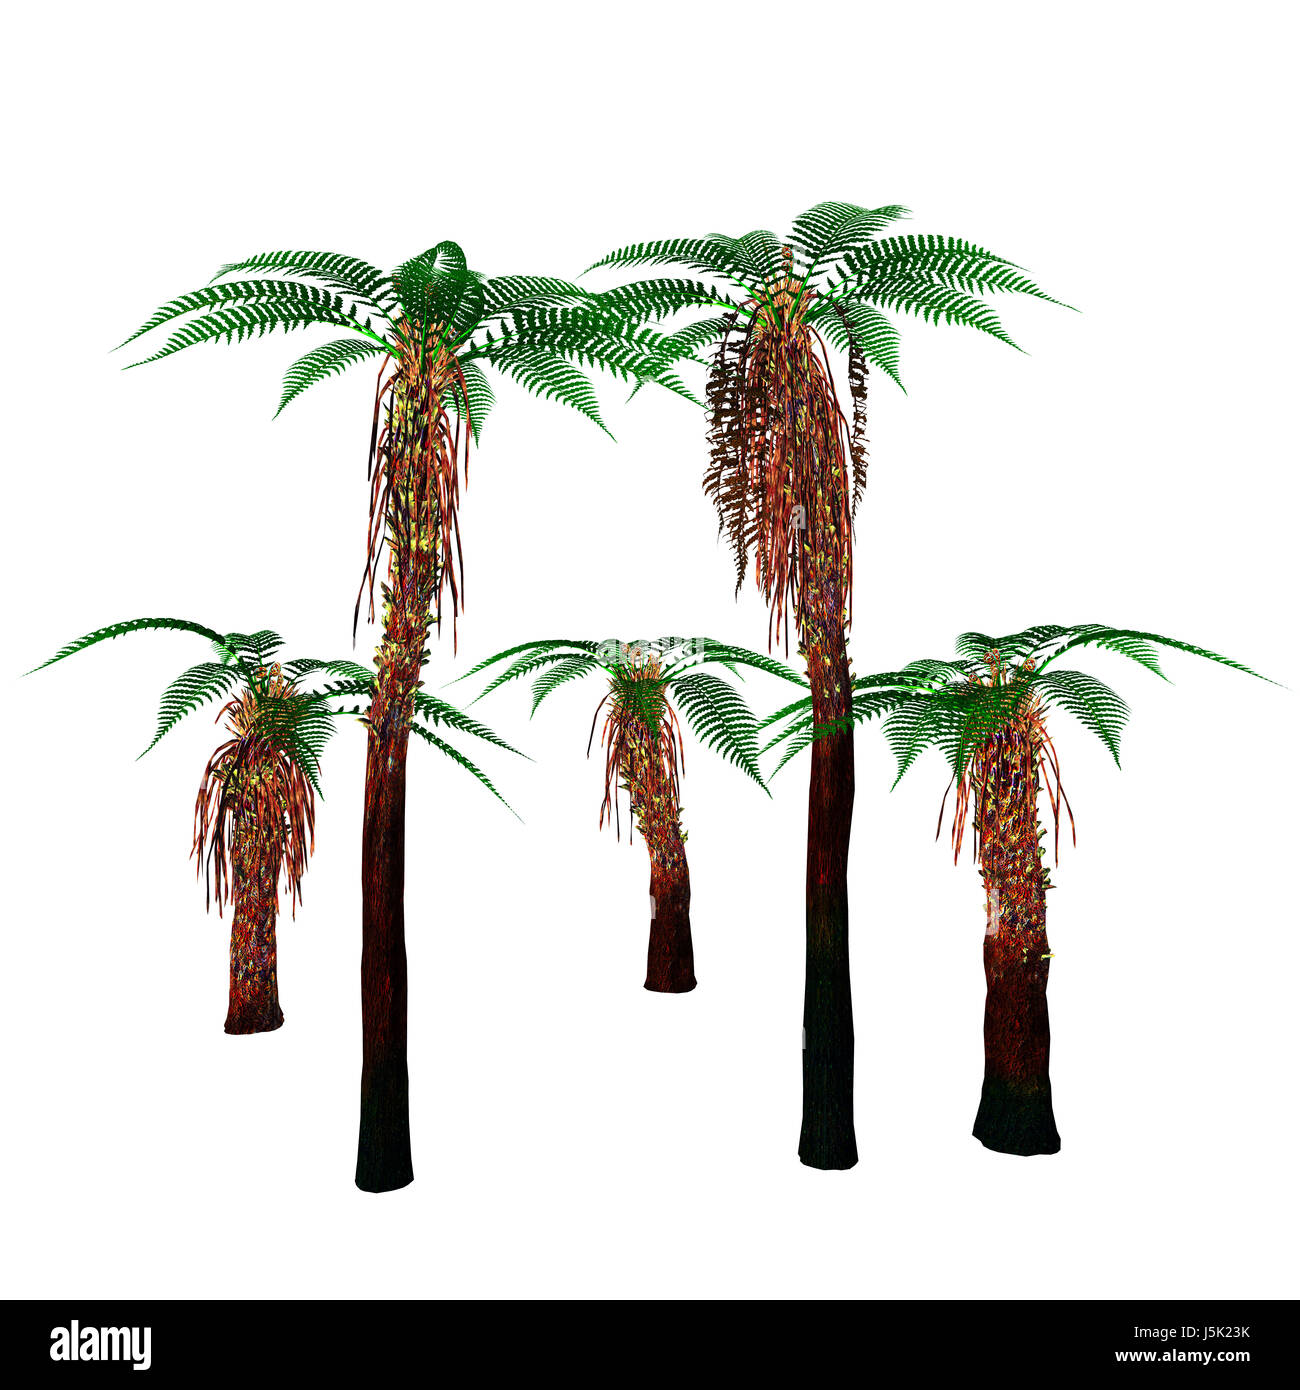 Dicksonia Trees - Dicksonia antarctica is an evergreen tree native to Australia and Tasmania. - Stock Image